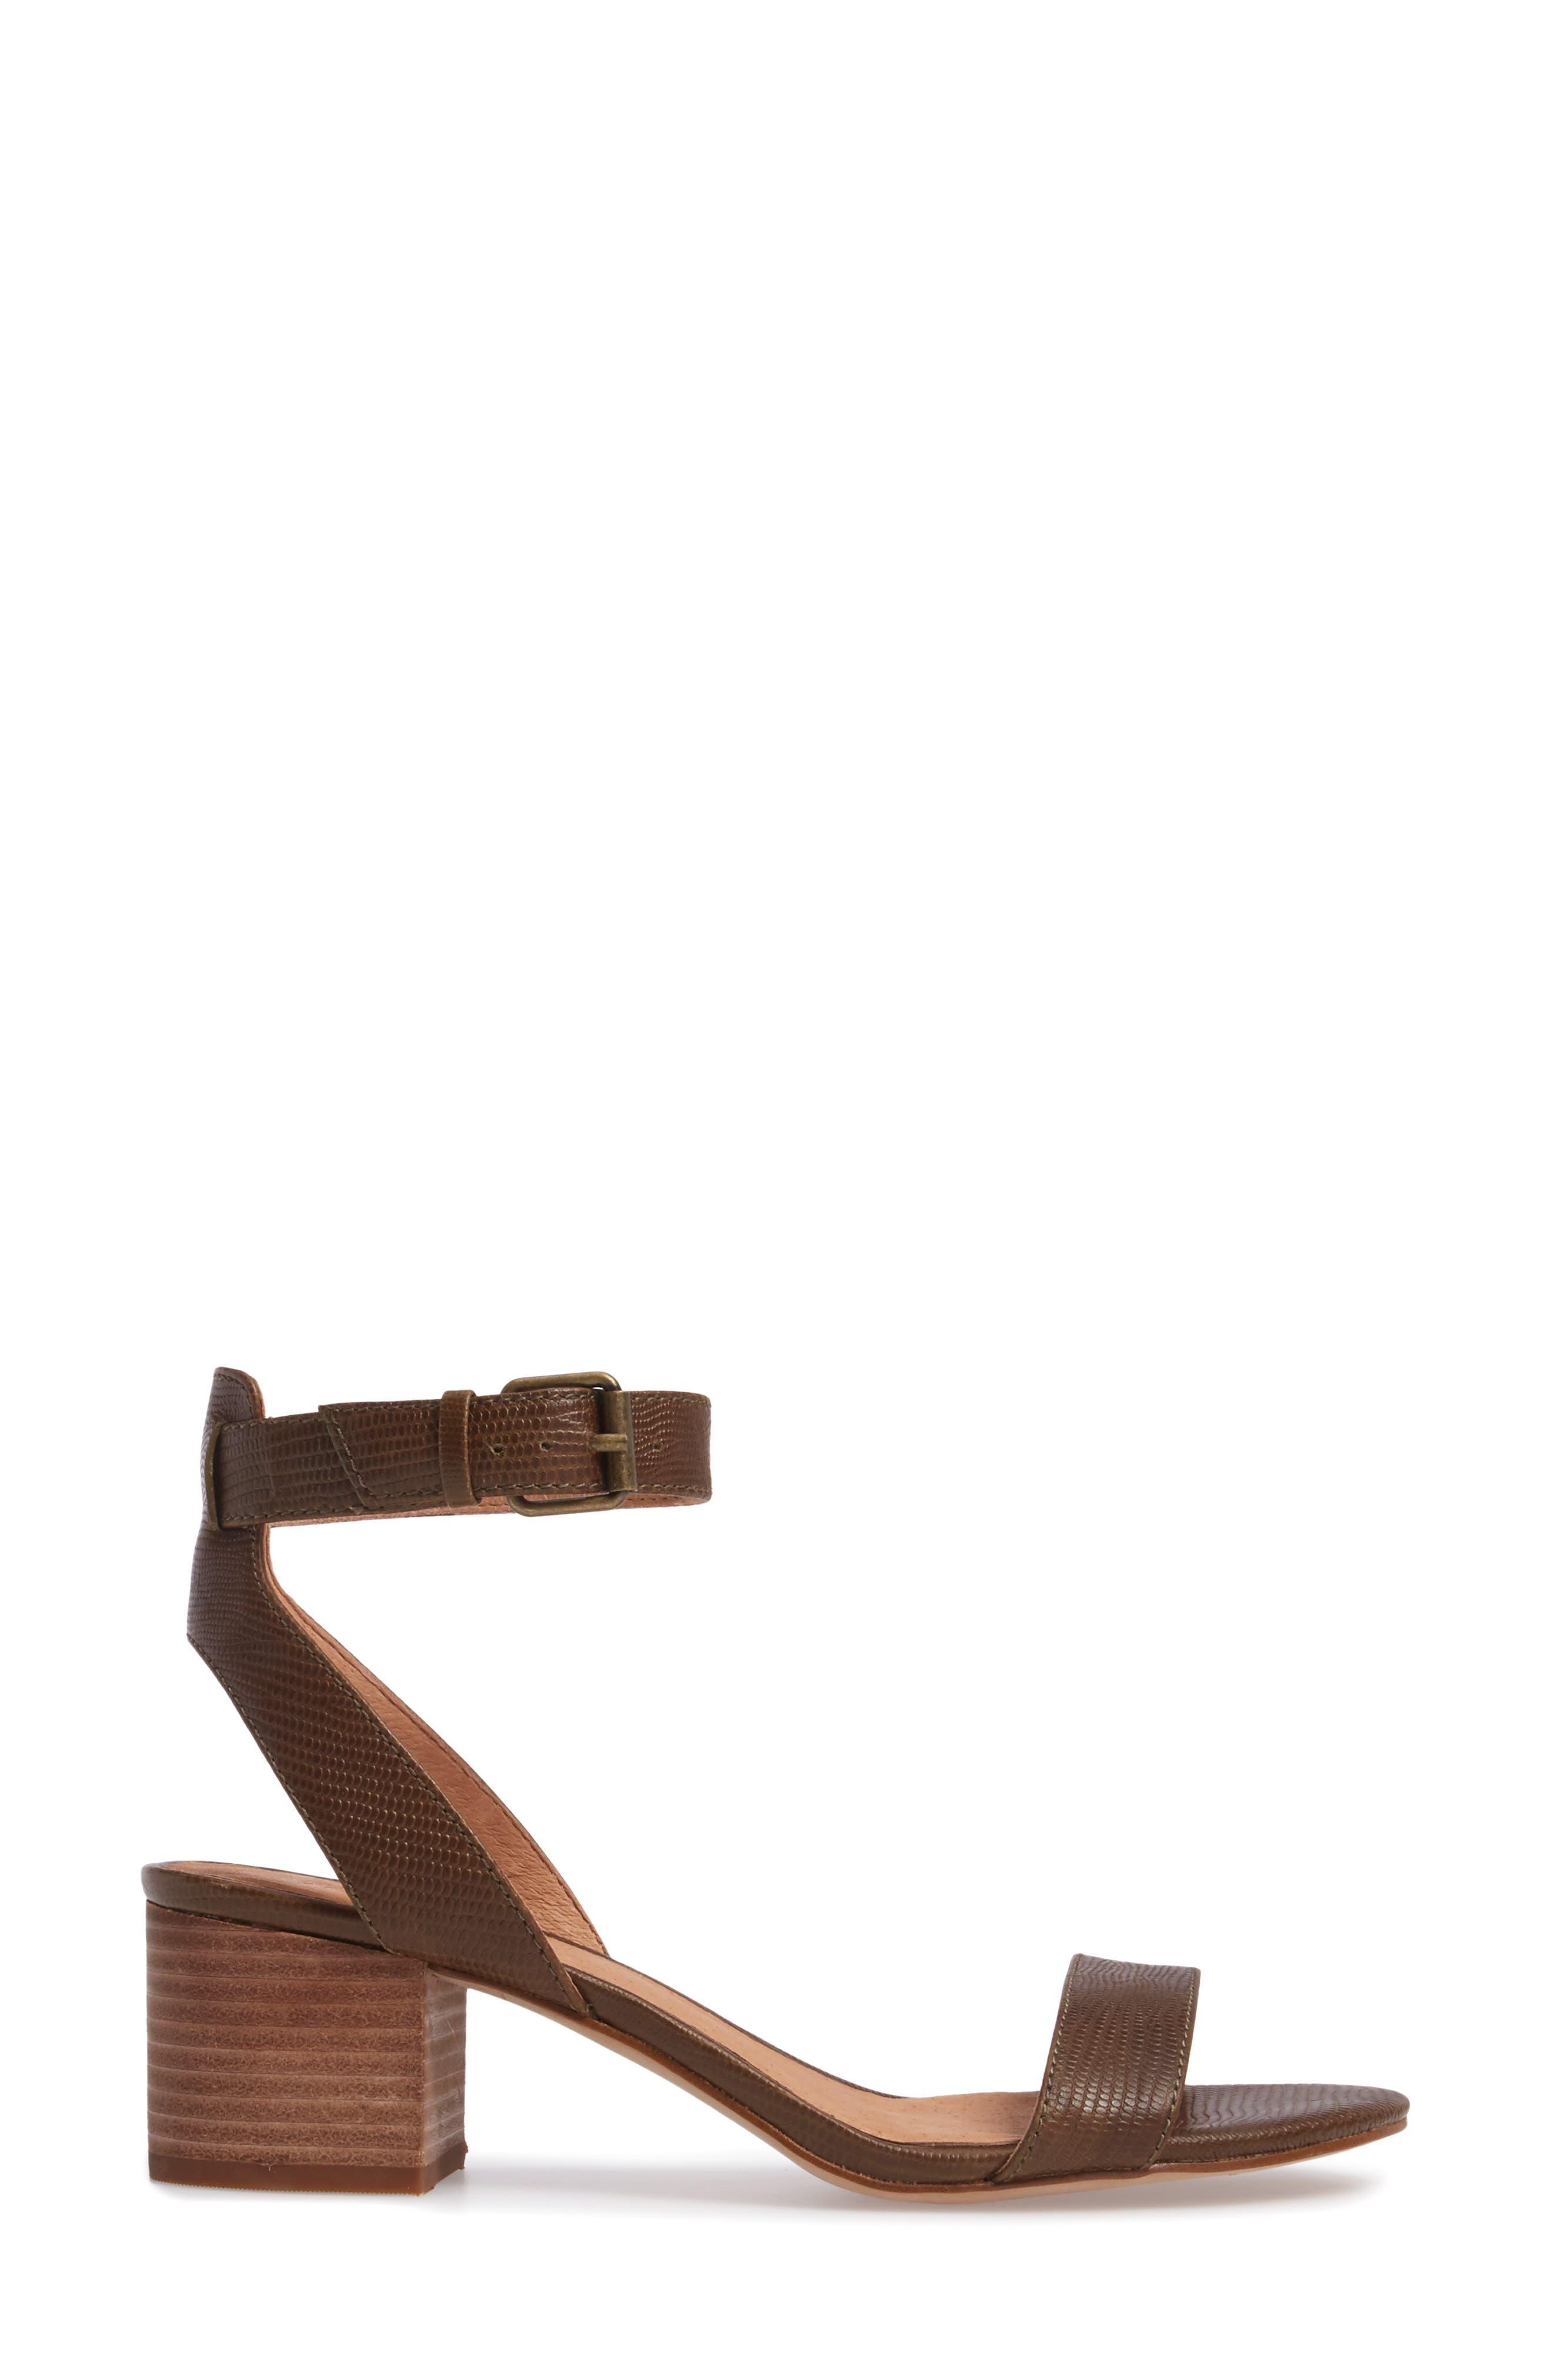 Alice Embossed Ankle Wrap Sandal,                             Alternate thumbnail 3, color,                             Safari Khaki Leather